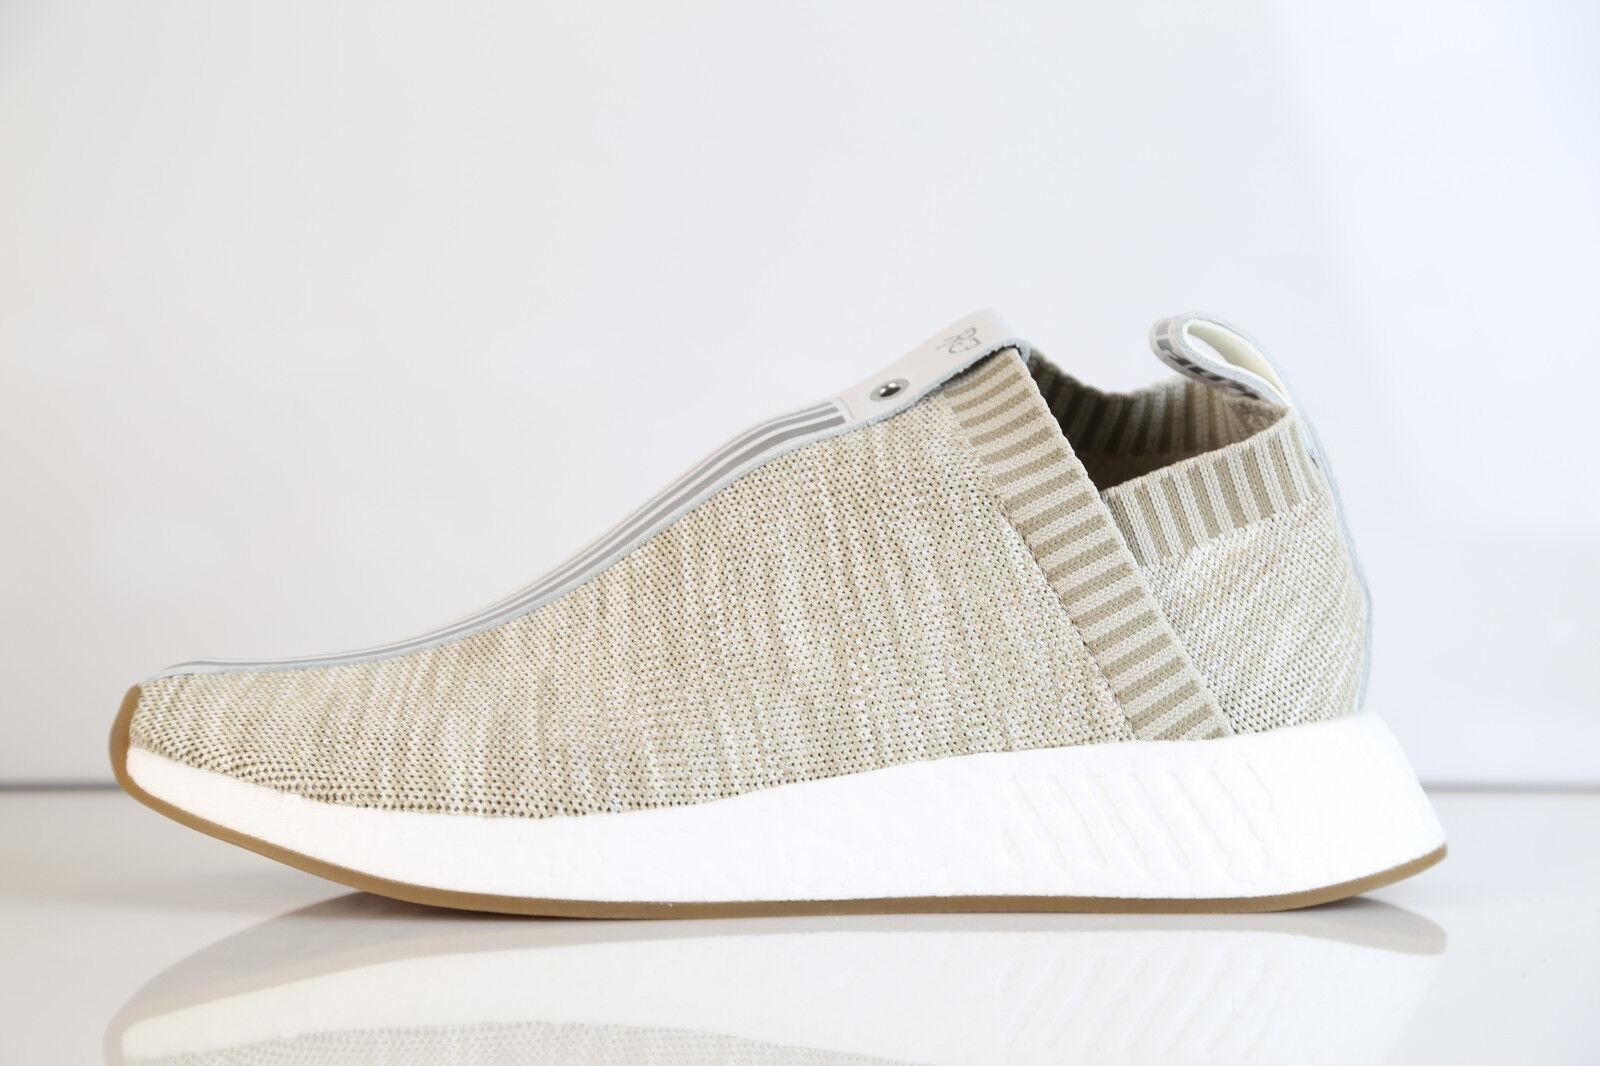 Adidas X Kith Kith Kith X Naked Consortium City Sock NMD C2 PK Tan BY2597 5-12 boost rf 523529